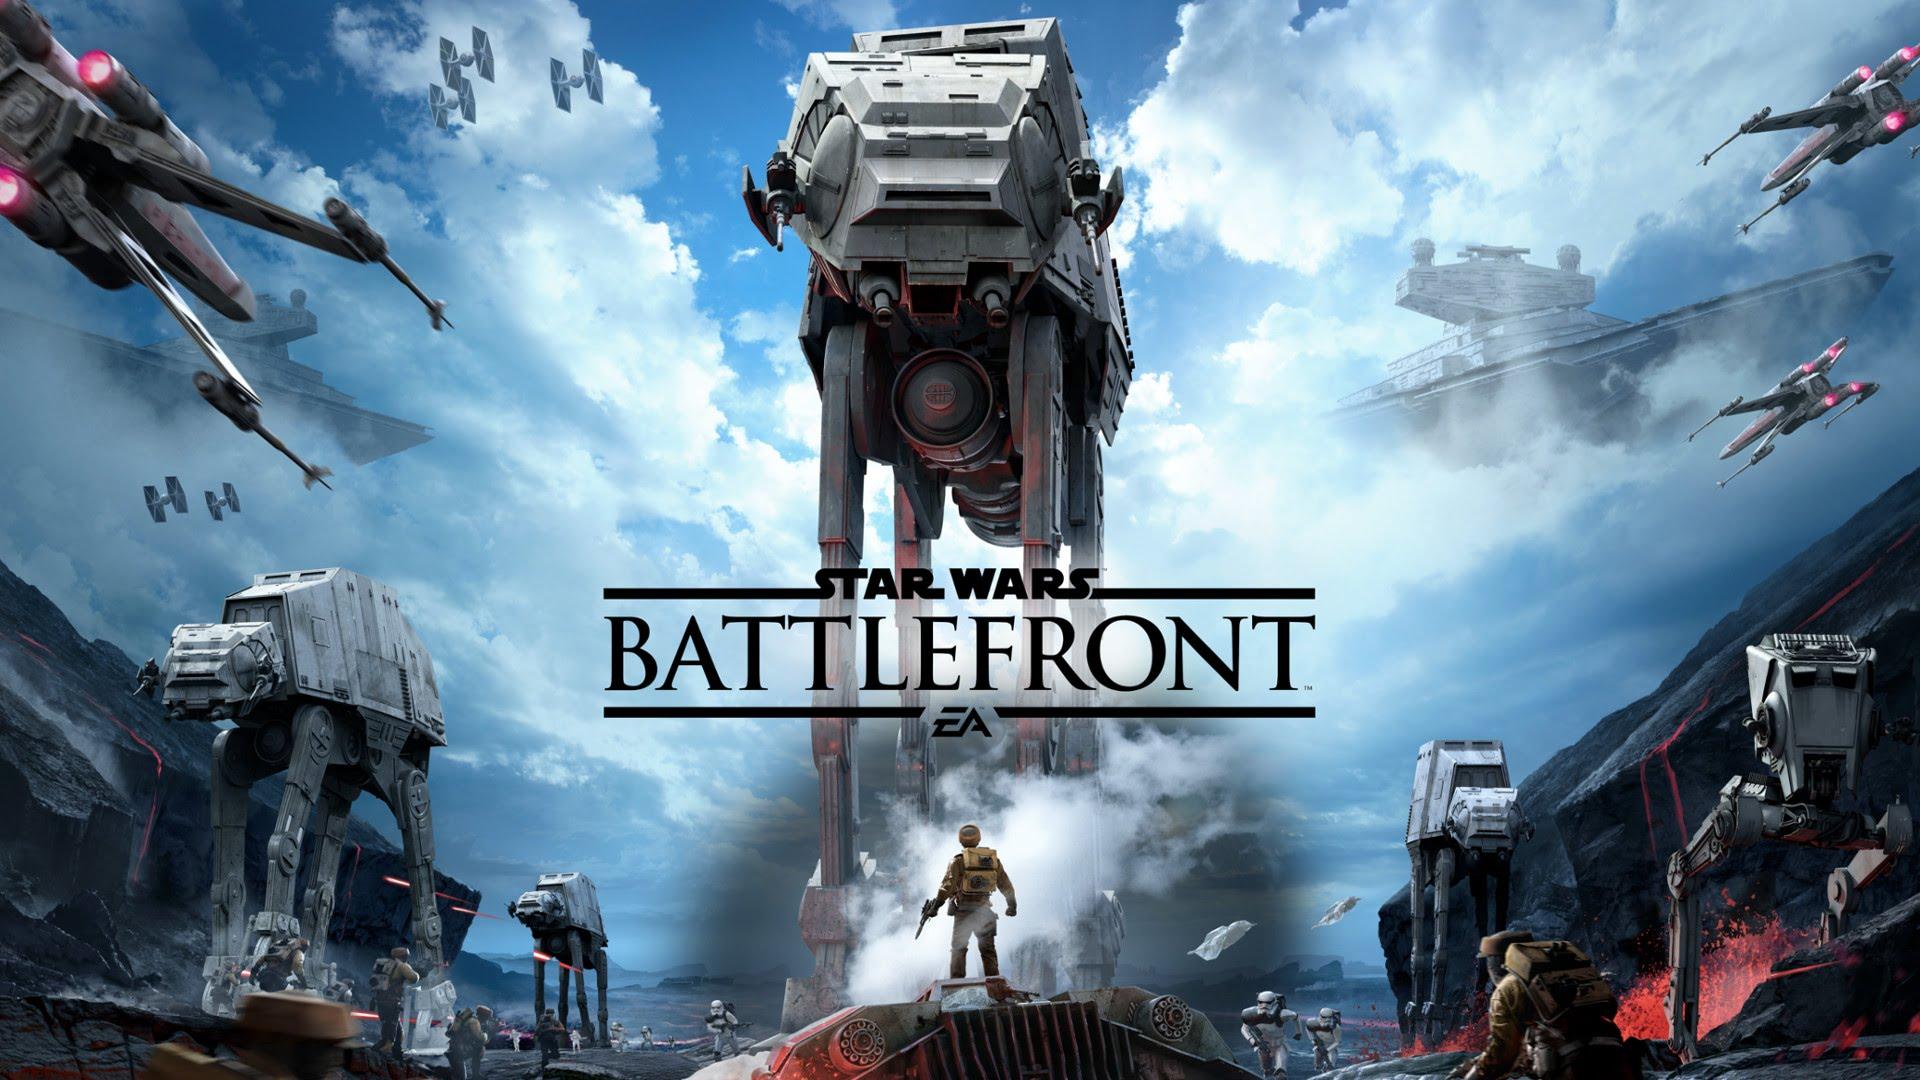 Star Wars Battlefront Wallpapers Archives - HDWallSource com